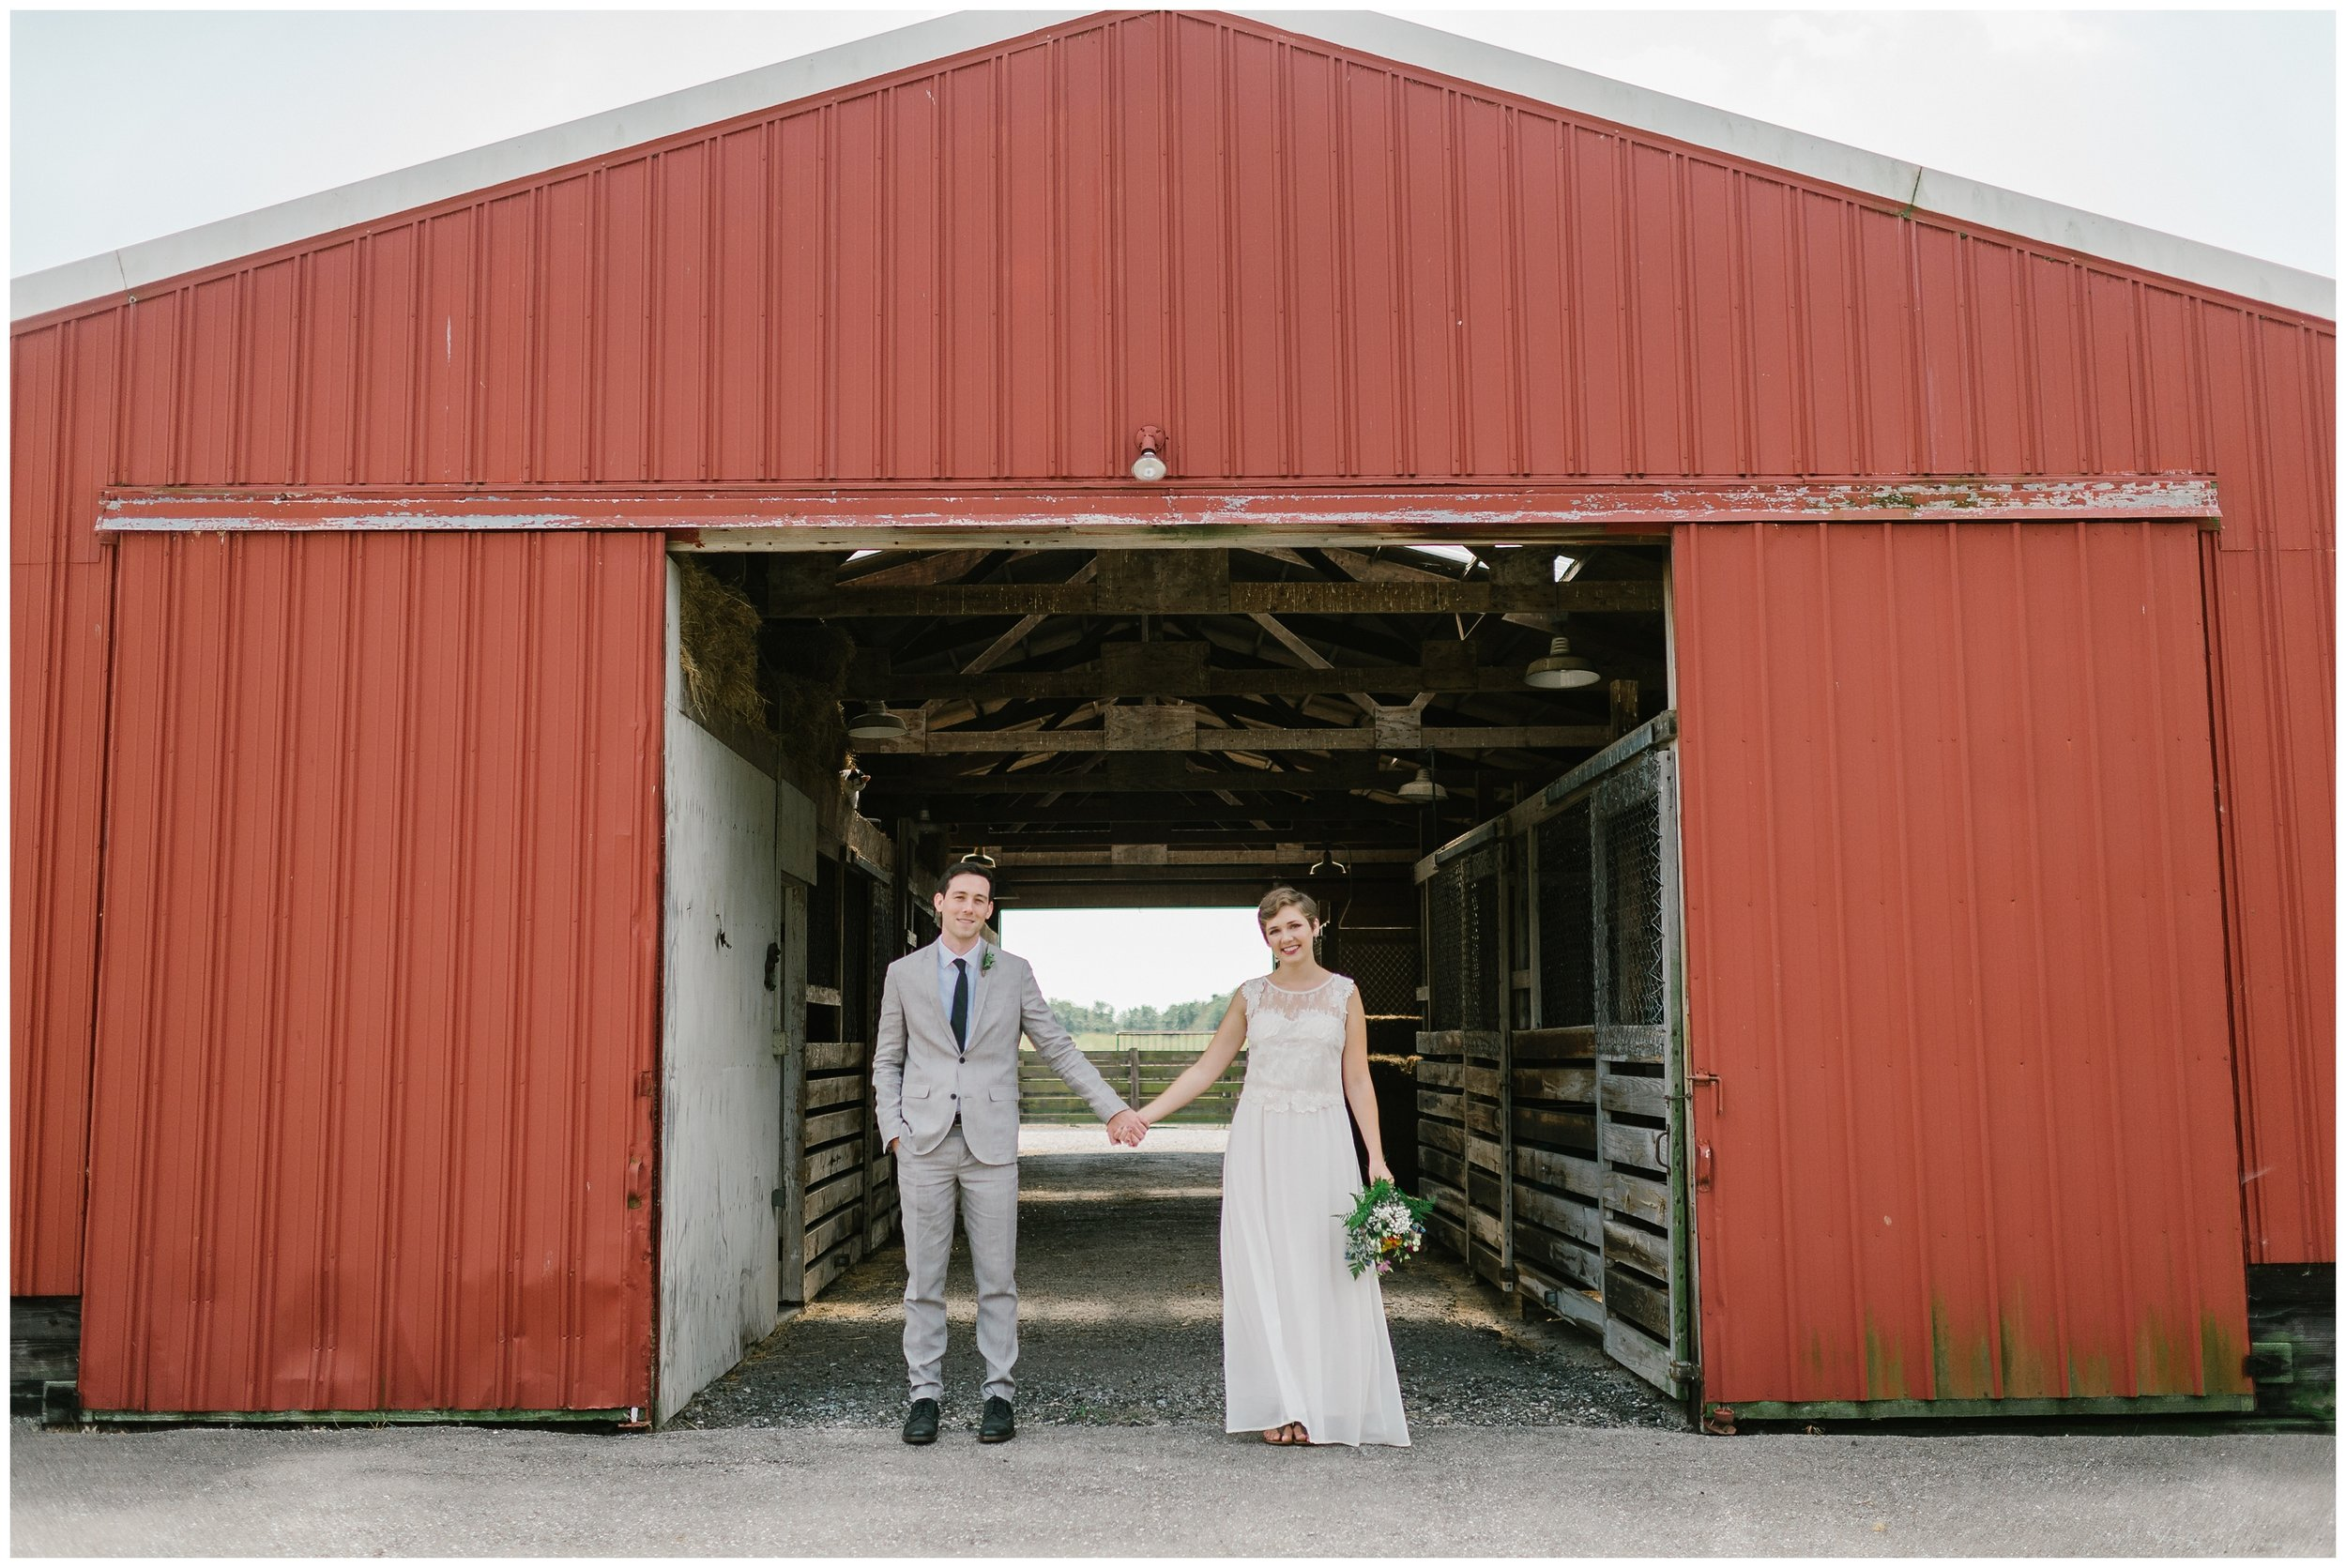 Rebecca_Shehorn_Photography_Indianapolis_Wedding_Photographer_7223.jpg